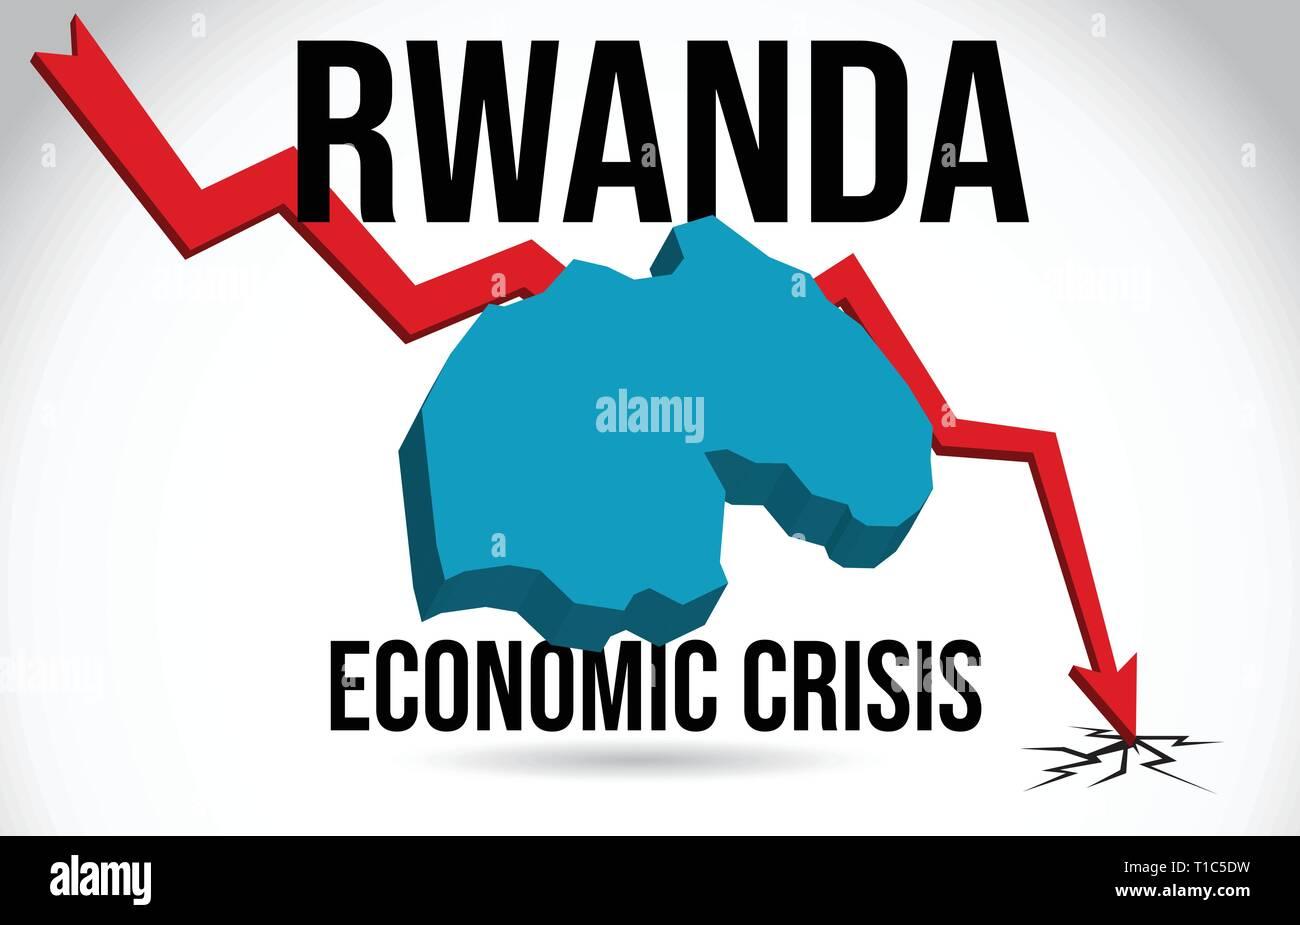 Rwanda Map Financial Crisis Economic Collapse Market Crash Global Meltdown Vector Illustration. - Stock Vector